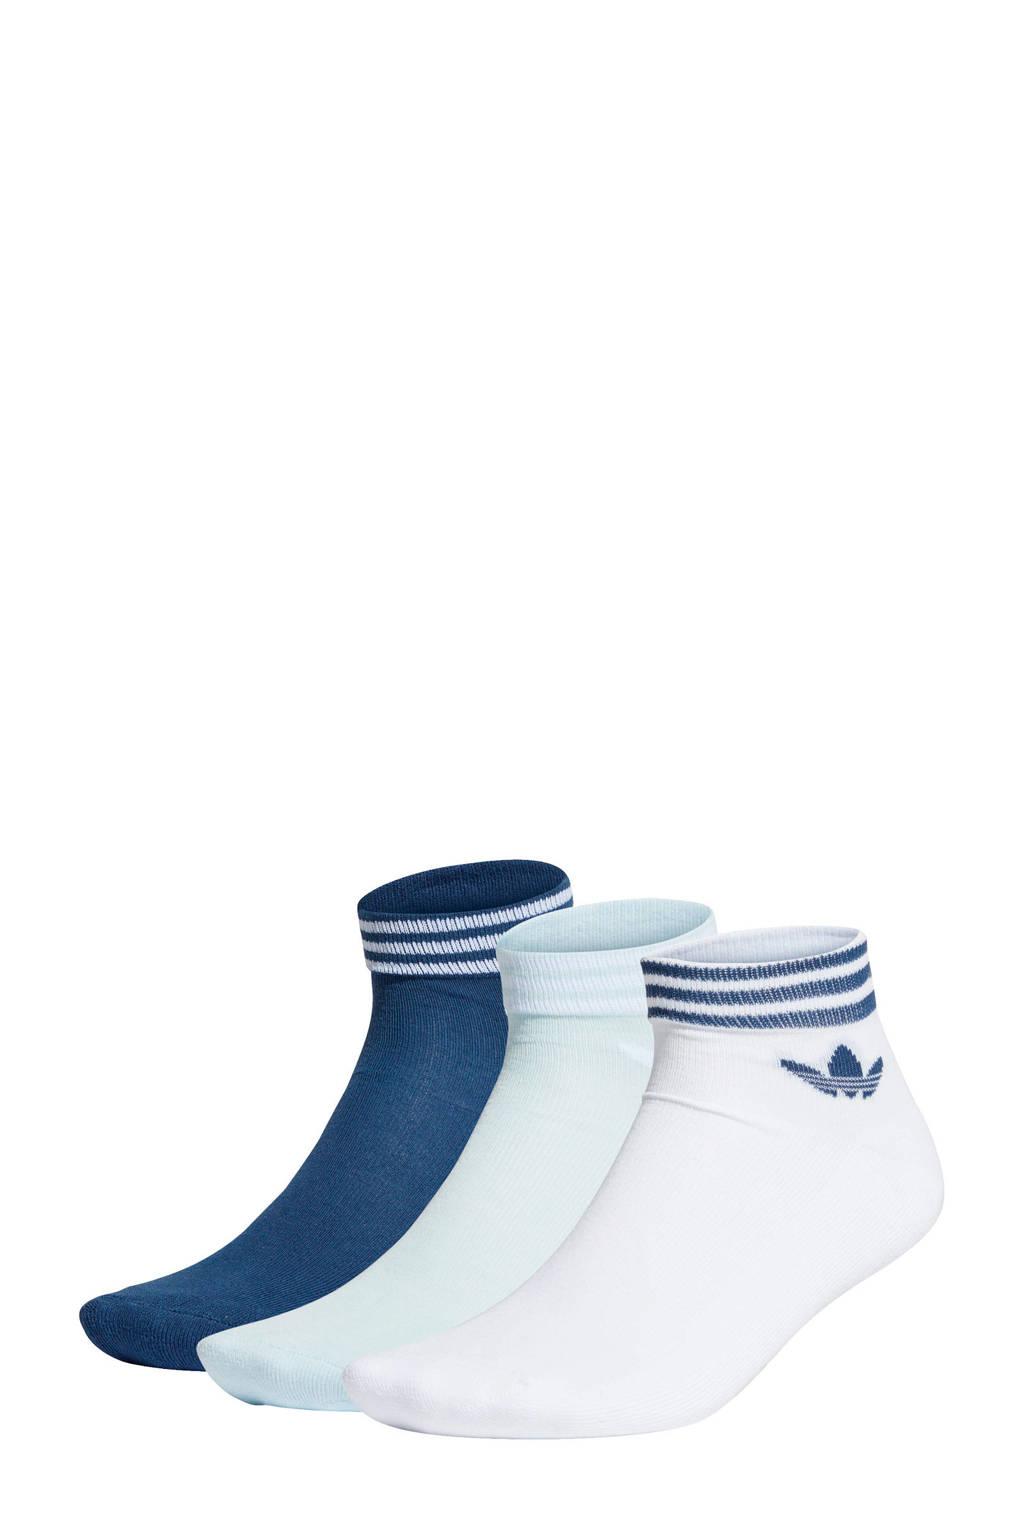 adidas Originals   sportsokken wit/blauw (set van 3), Wit/blauw